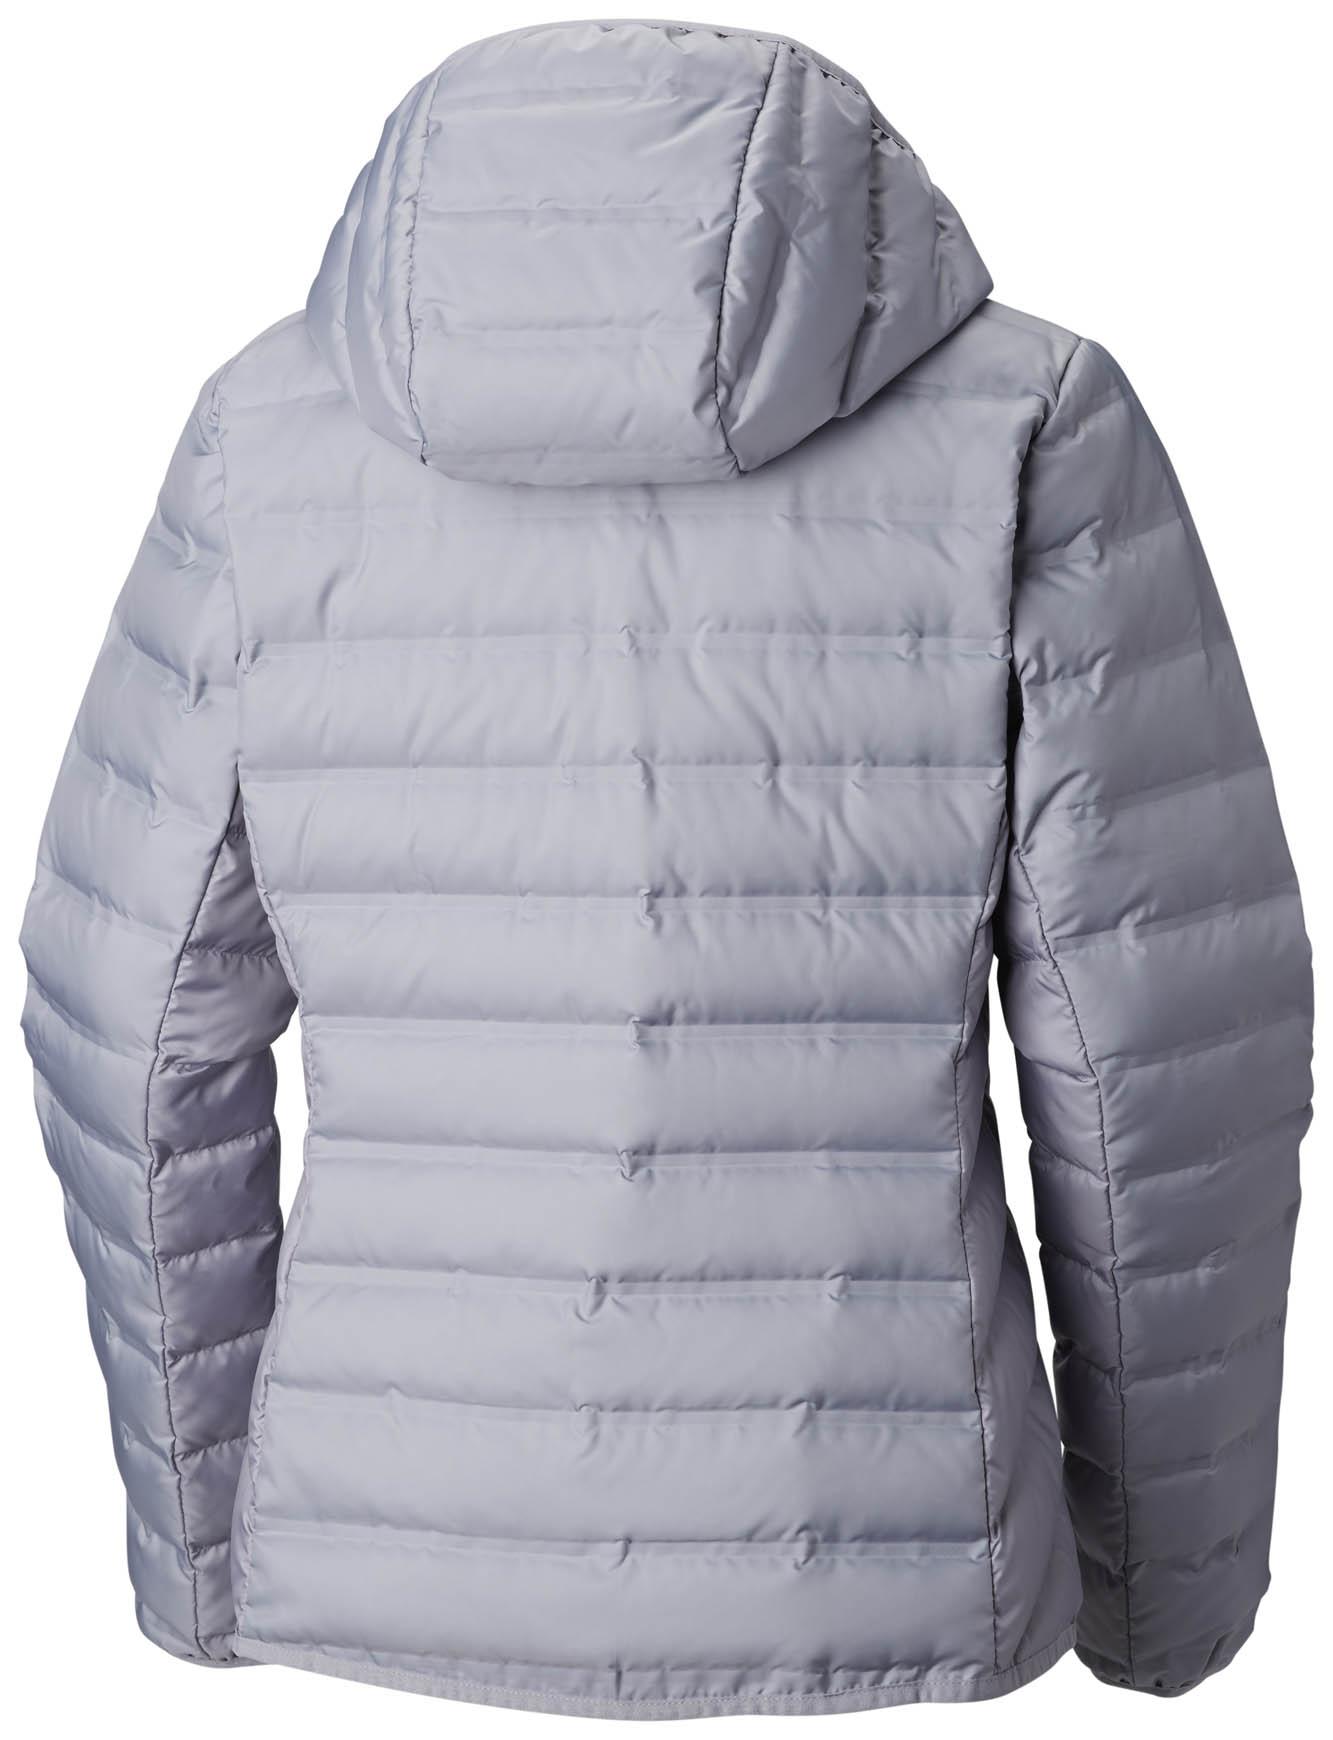 2b645185b4b Lake 22 Hooded Jacket W Astral Columbia   Doudounes   Snowleader